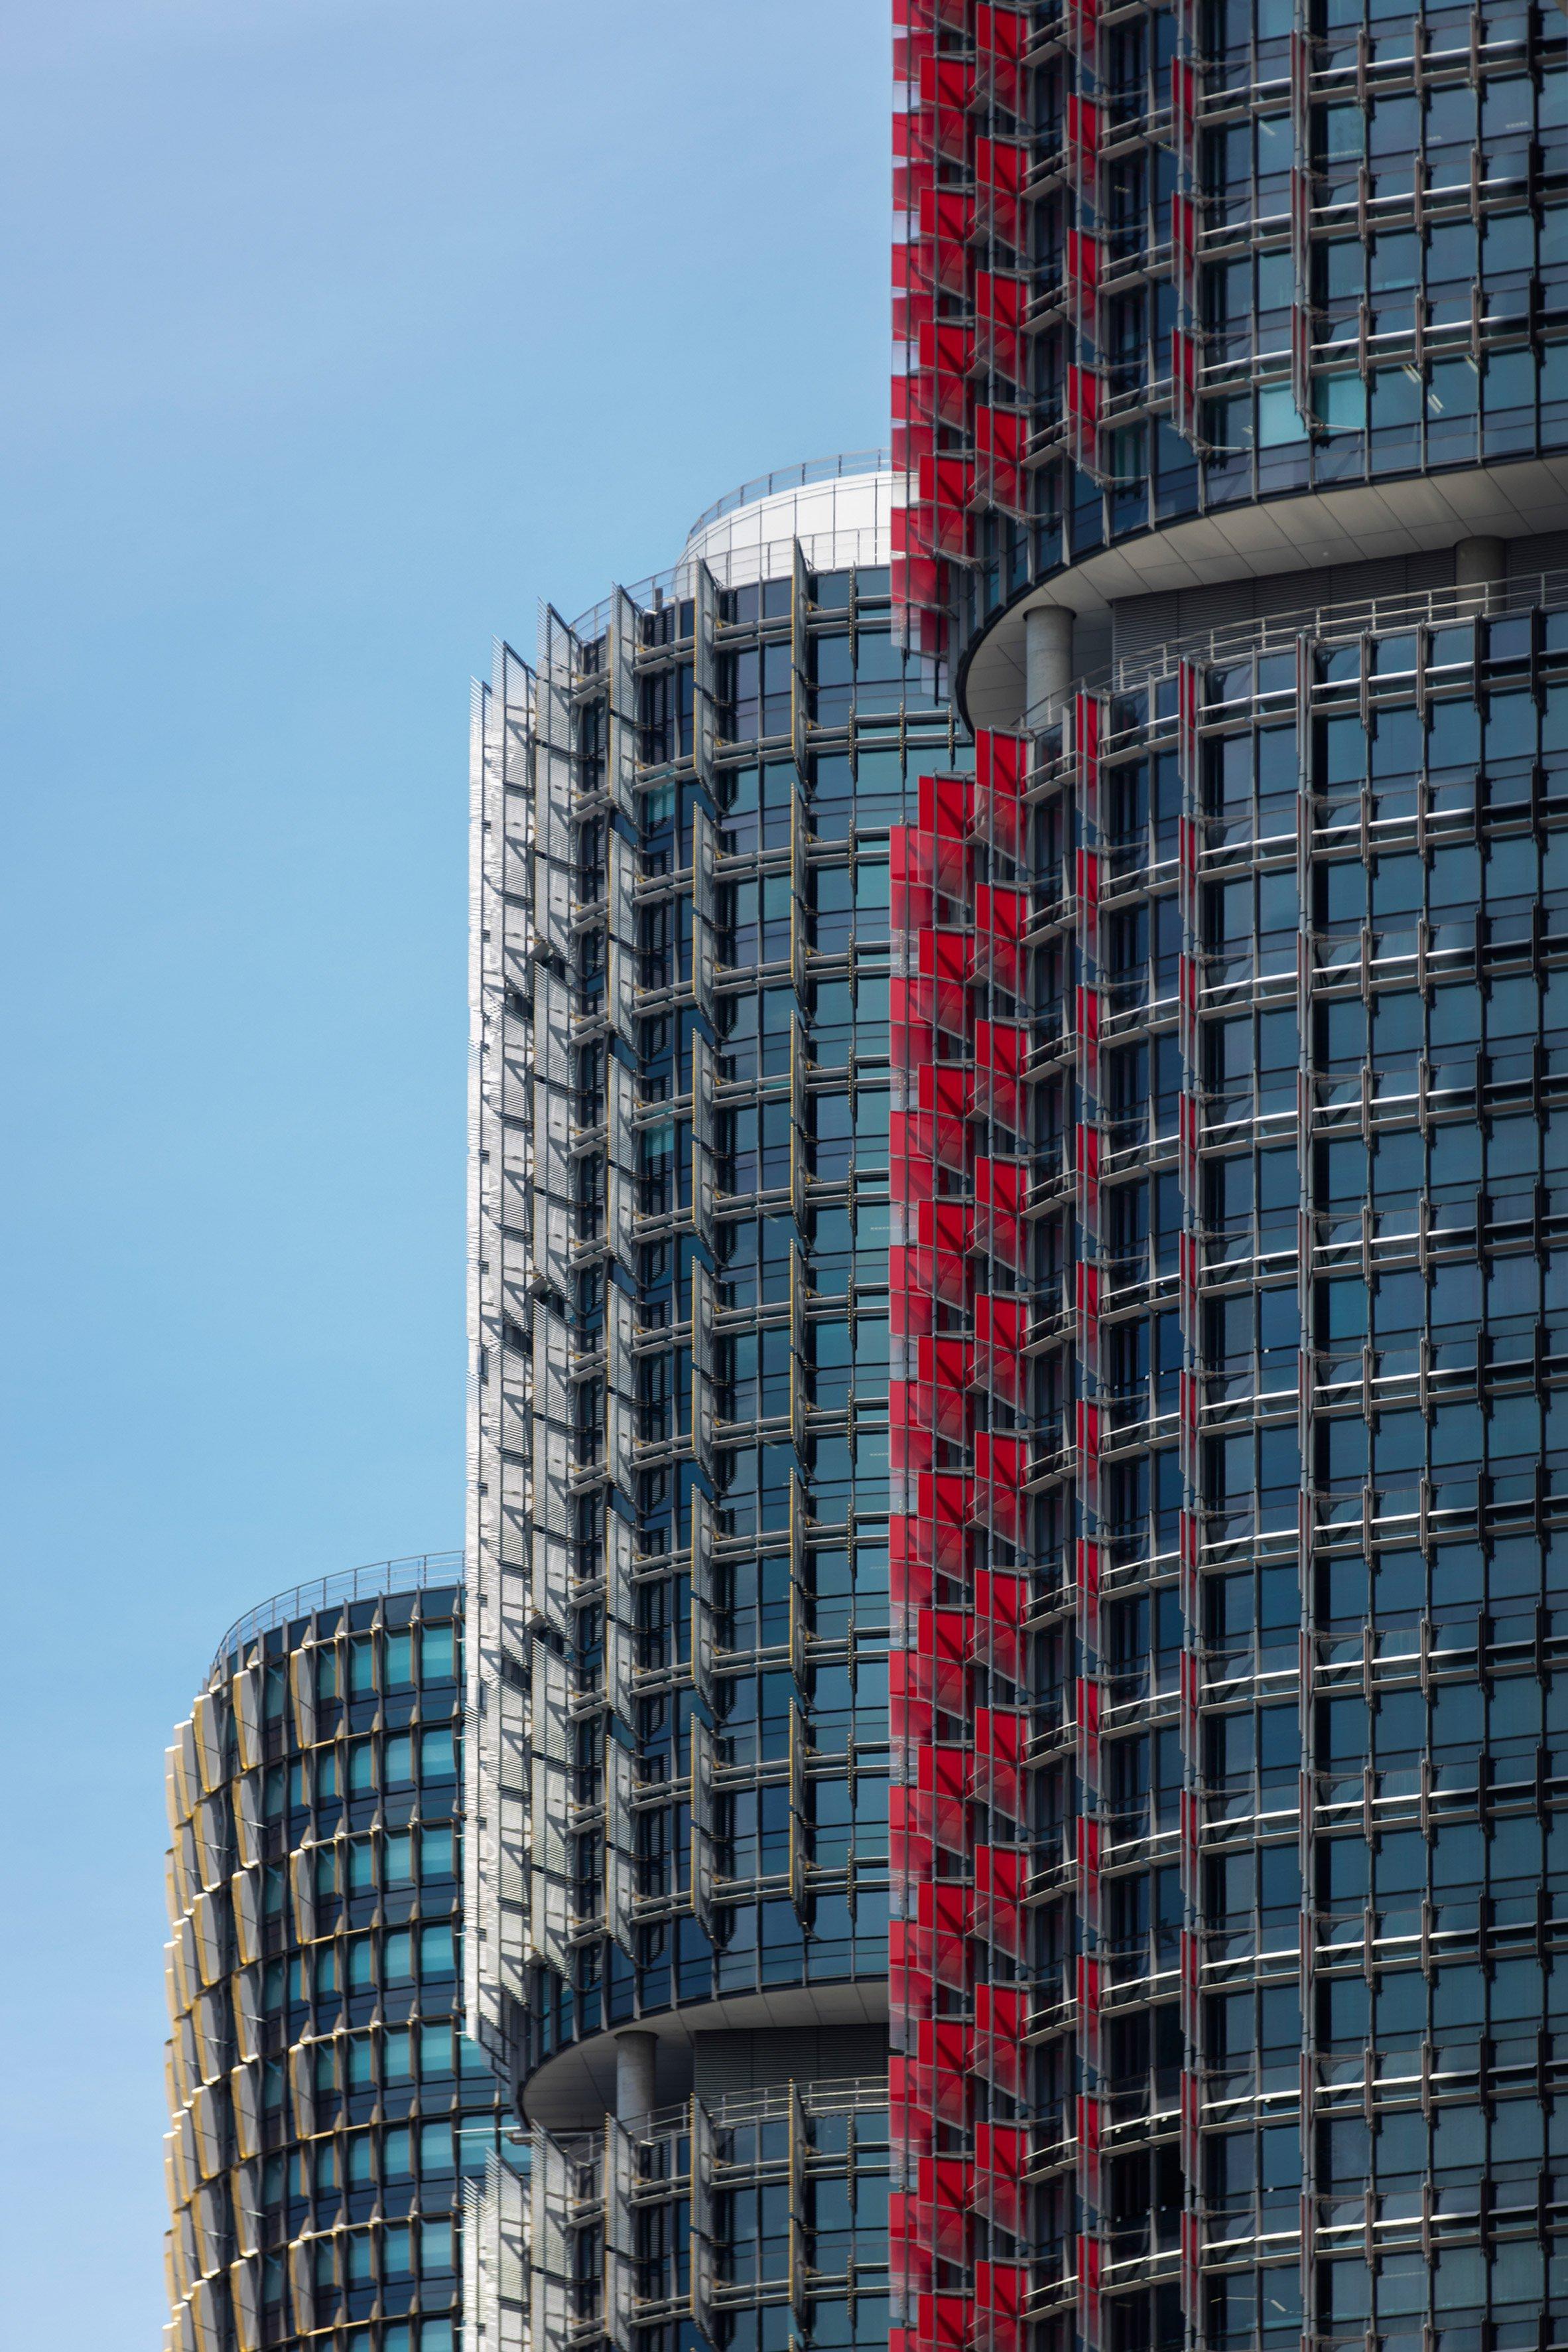 Rogers Stirk Harbour completes skyscraper trio on Sydney's Barangaroo waterfront